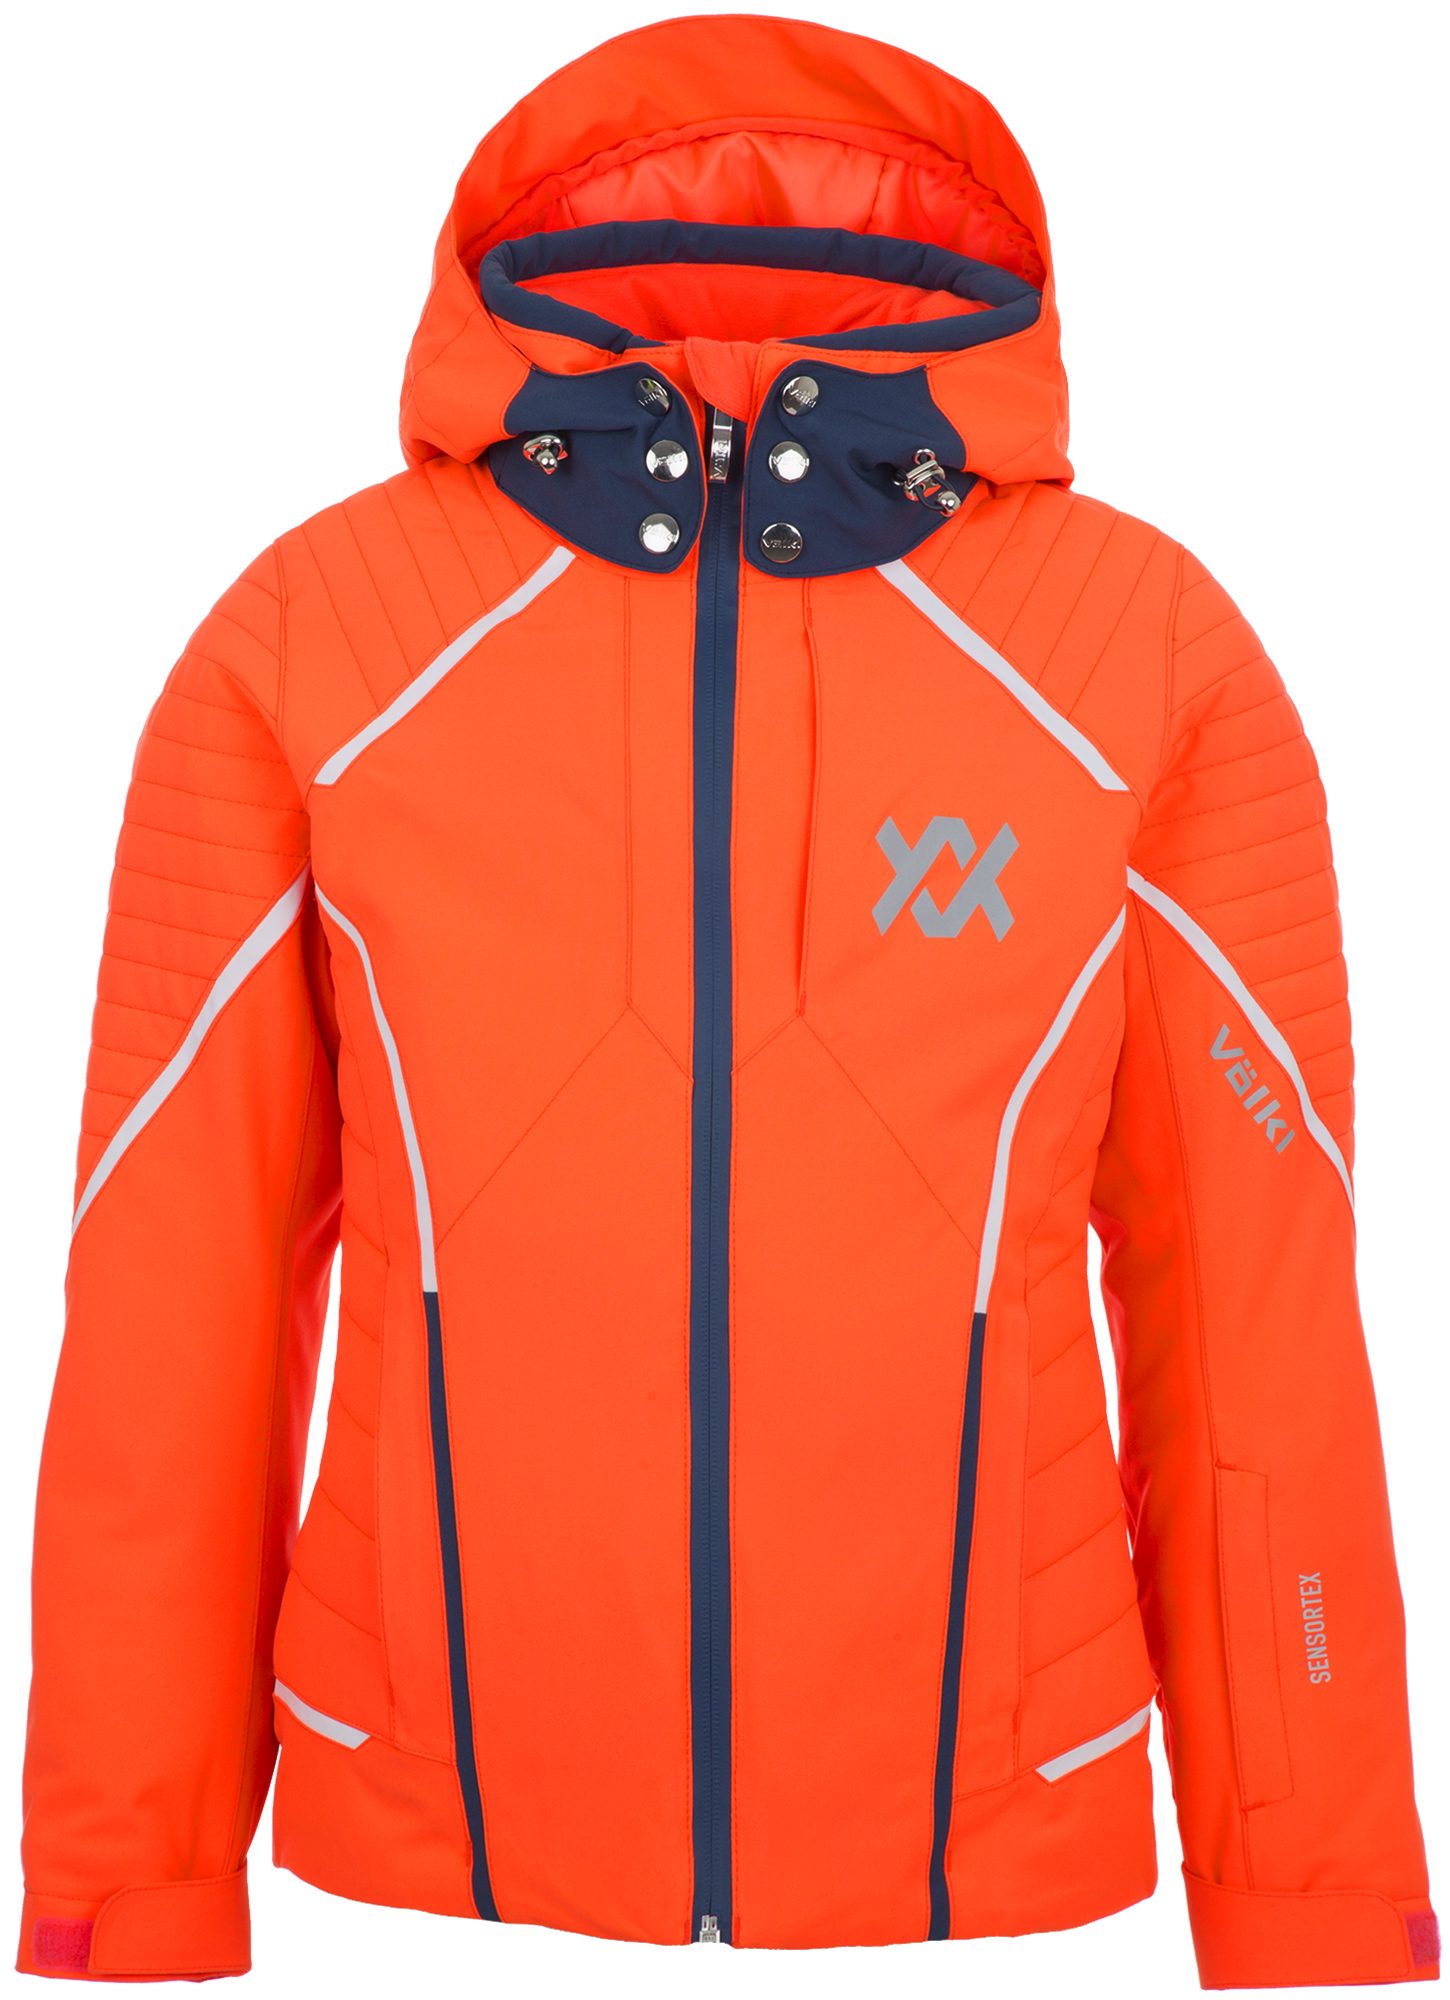 Volkl Куртка утепленная для девочек Volkl, размер 152 volkl volkl flair sc vmotion 11 alu gw lady 18 19 размер 158